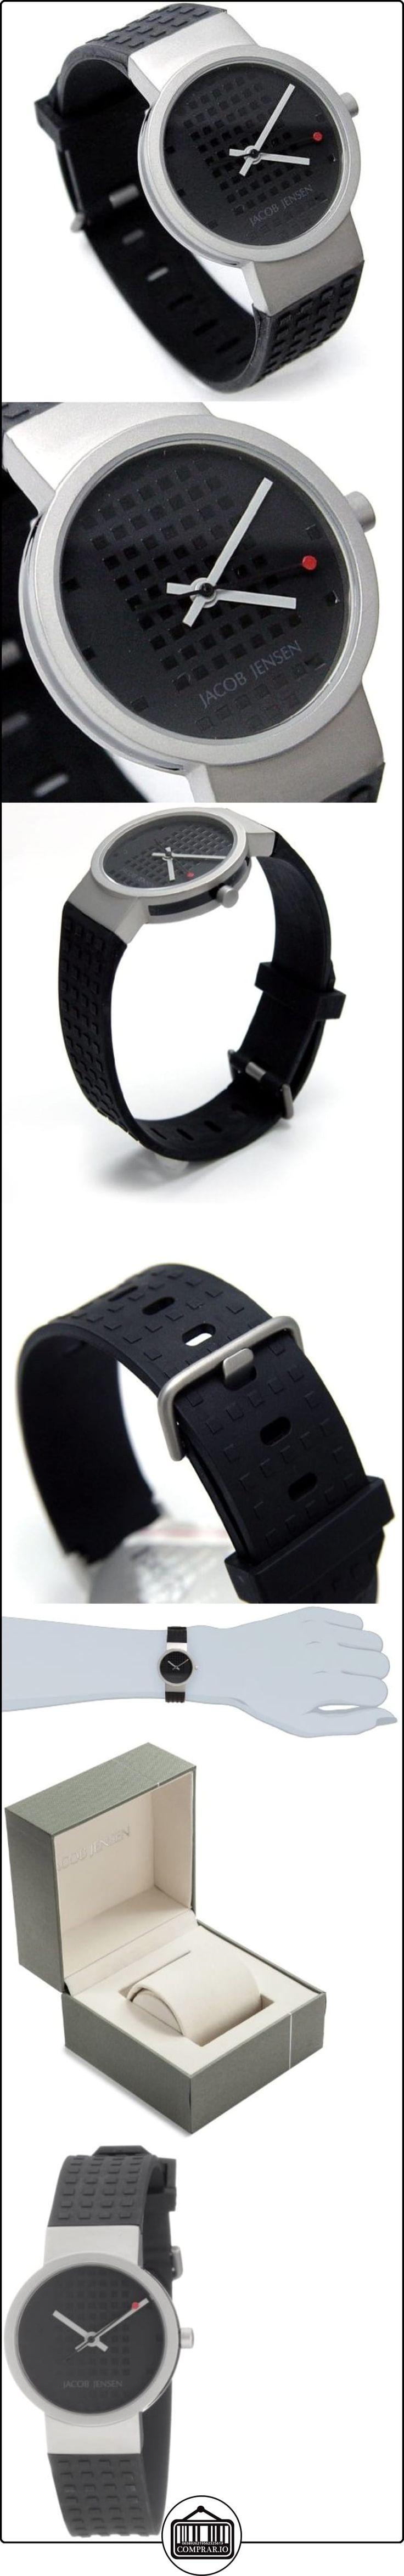 Jacob Jensen Clear Serie 32422S - Reloj de mujer de cuarzo, correa de goma color negro de  ✿ Relojes para mujer - (Gama media/alta) ✿